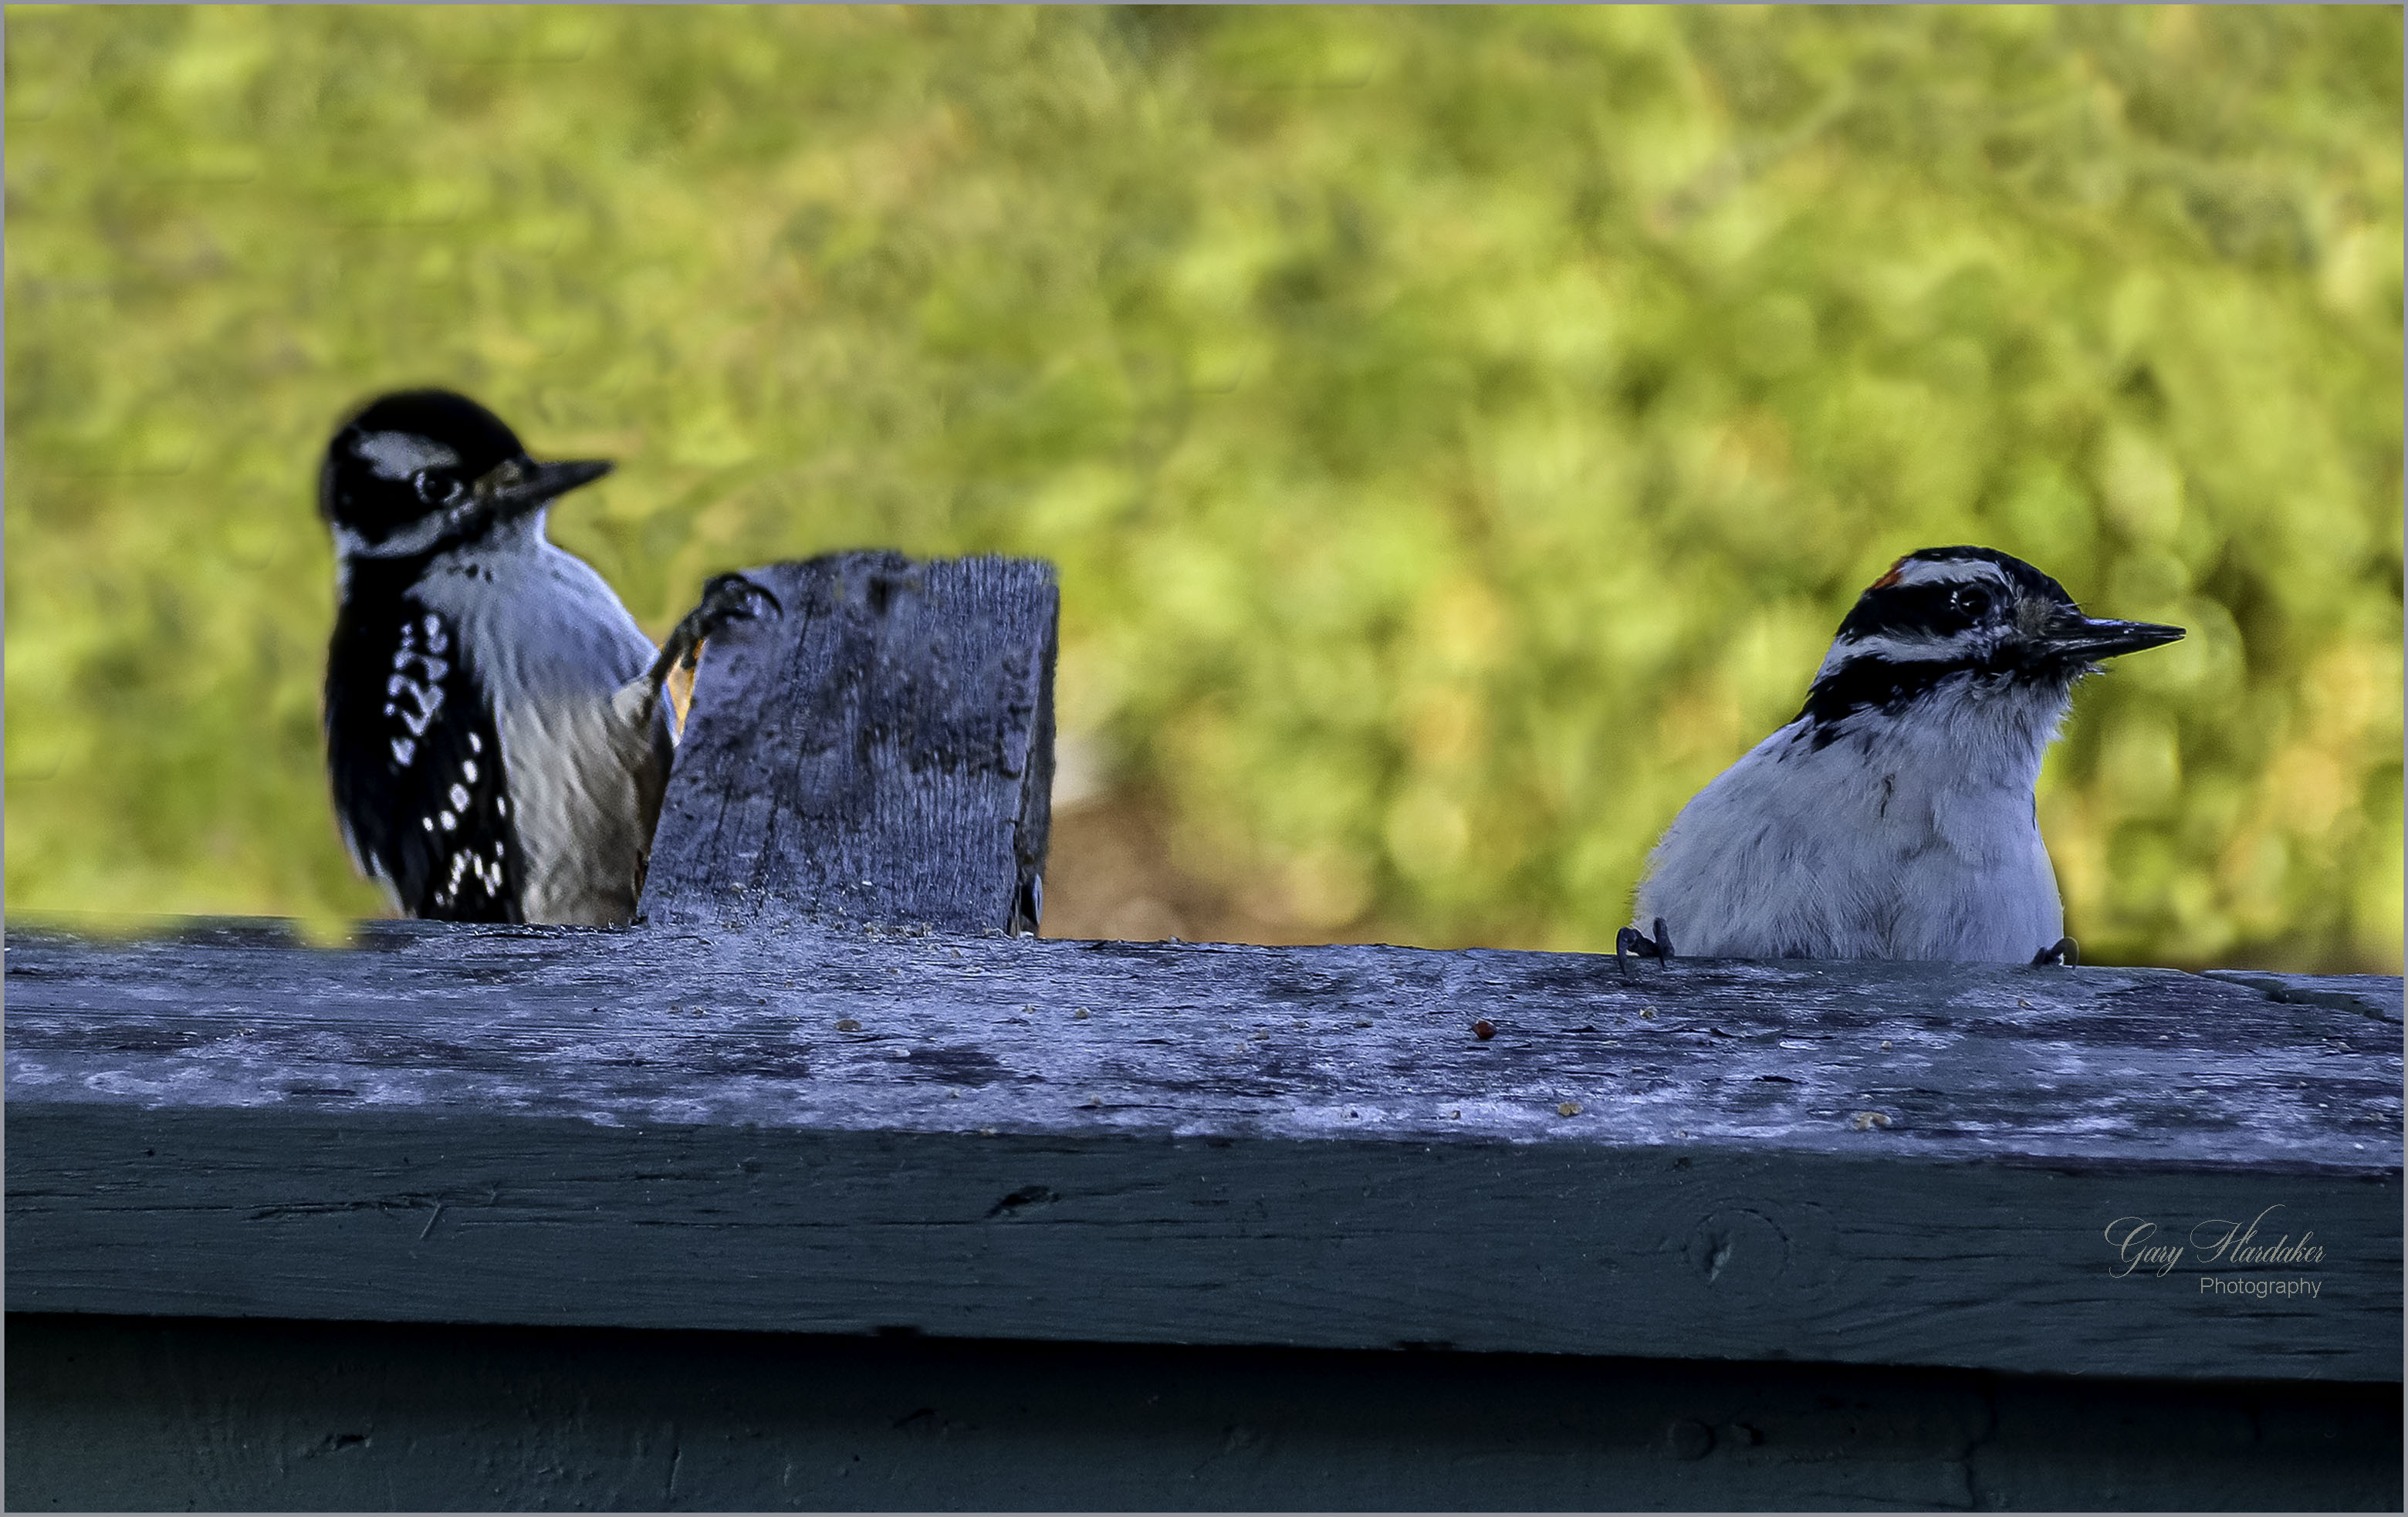 Birds of a Feather- Gary Hardaker